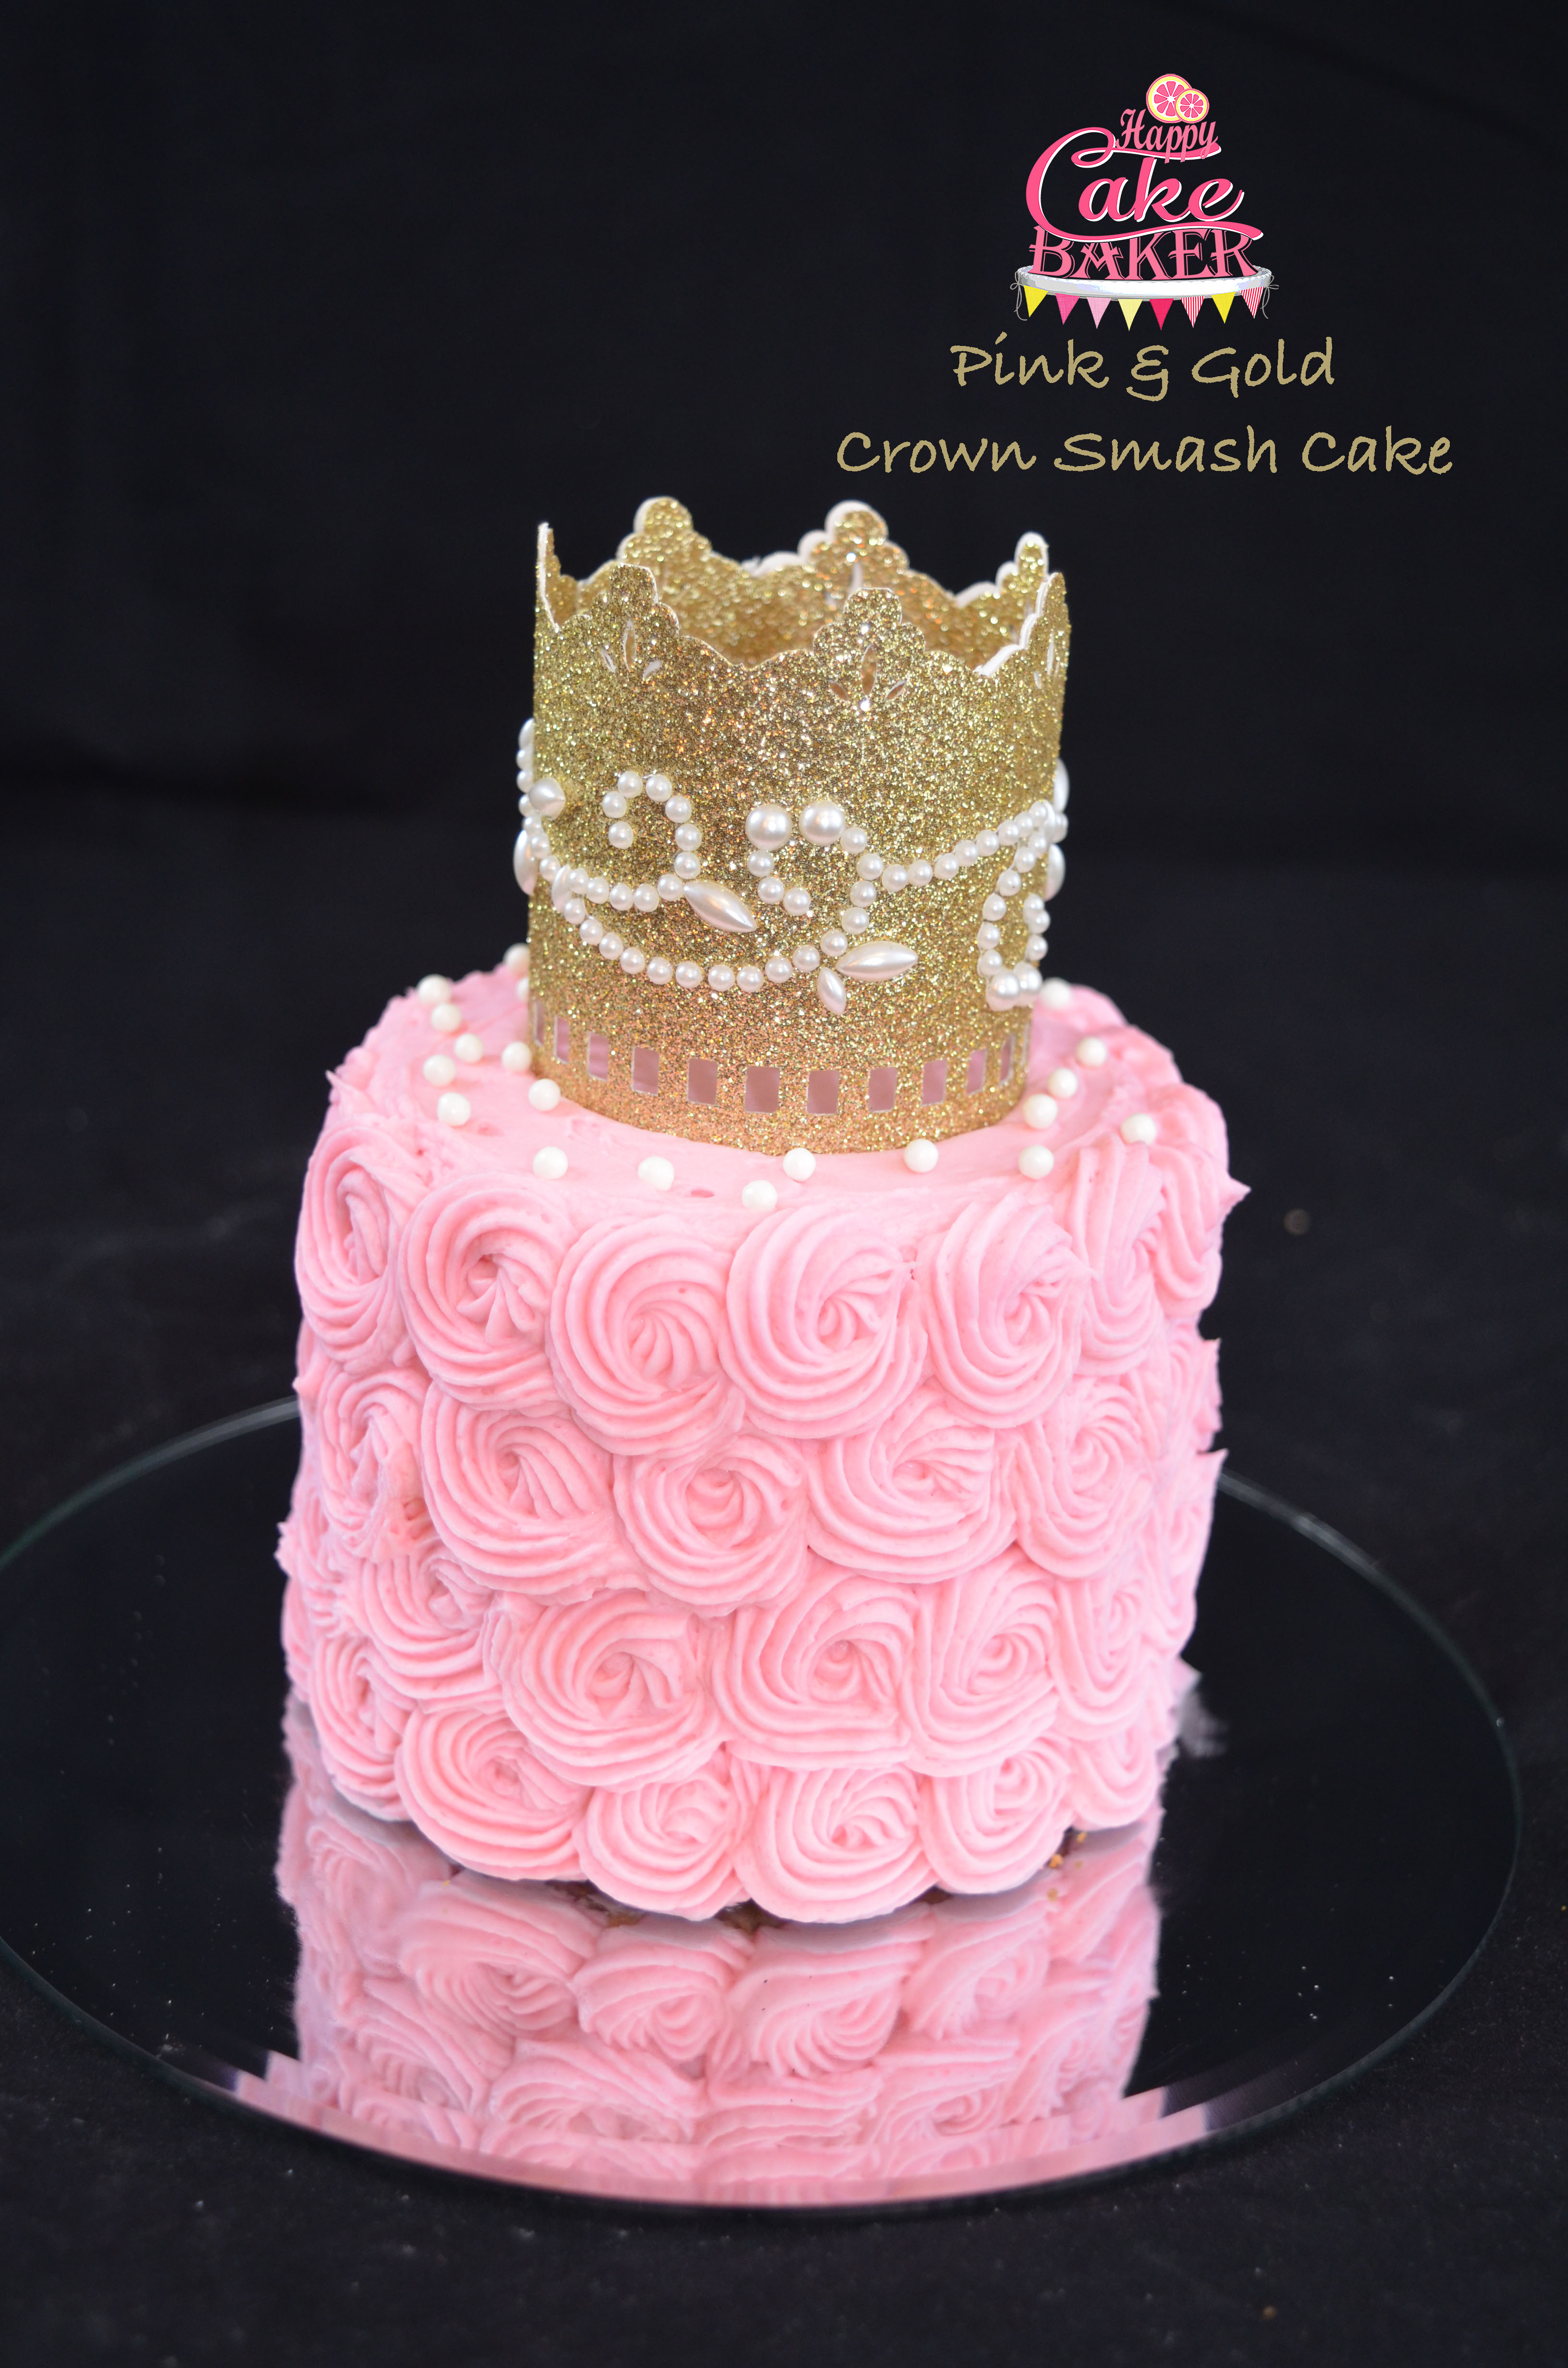 Pink Amp Gold Crown Smash Cake Happy Cake Baker